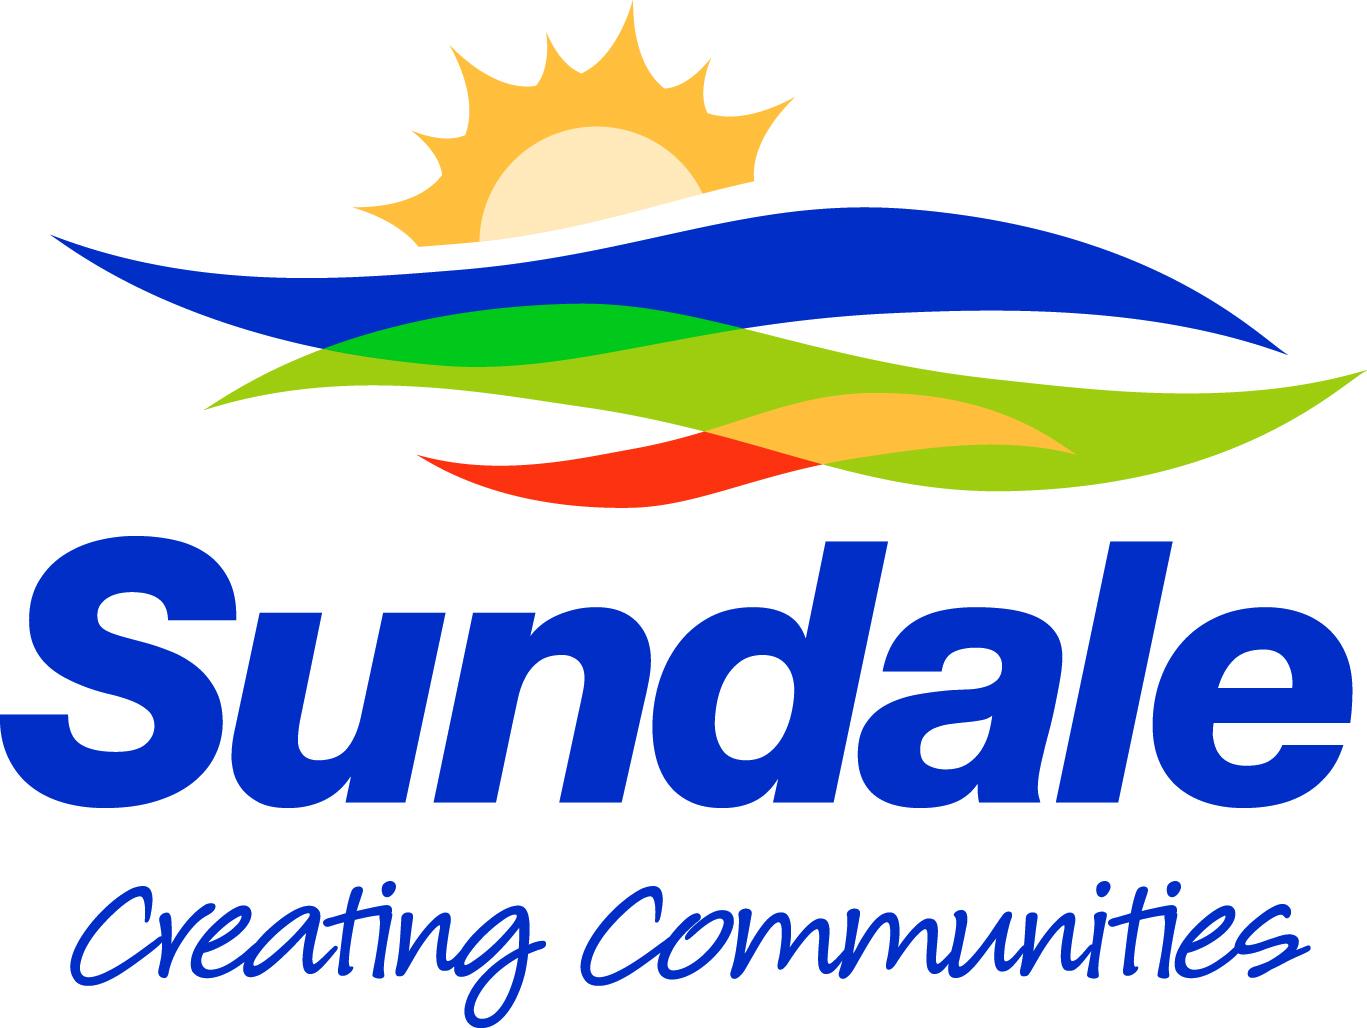 Sundale_Top_TextMiddle_CCLower.jpg